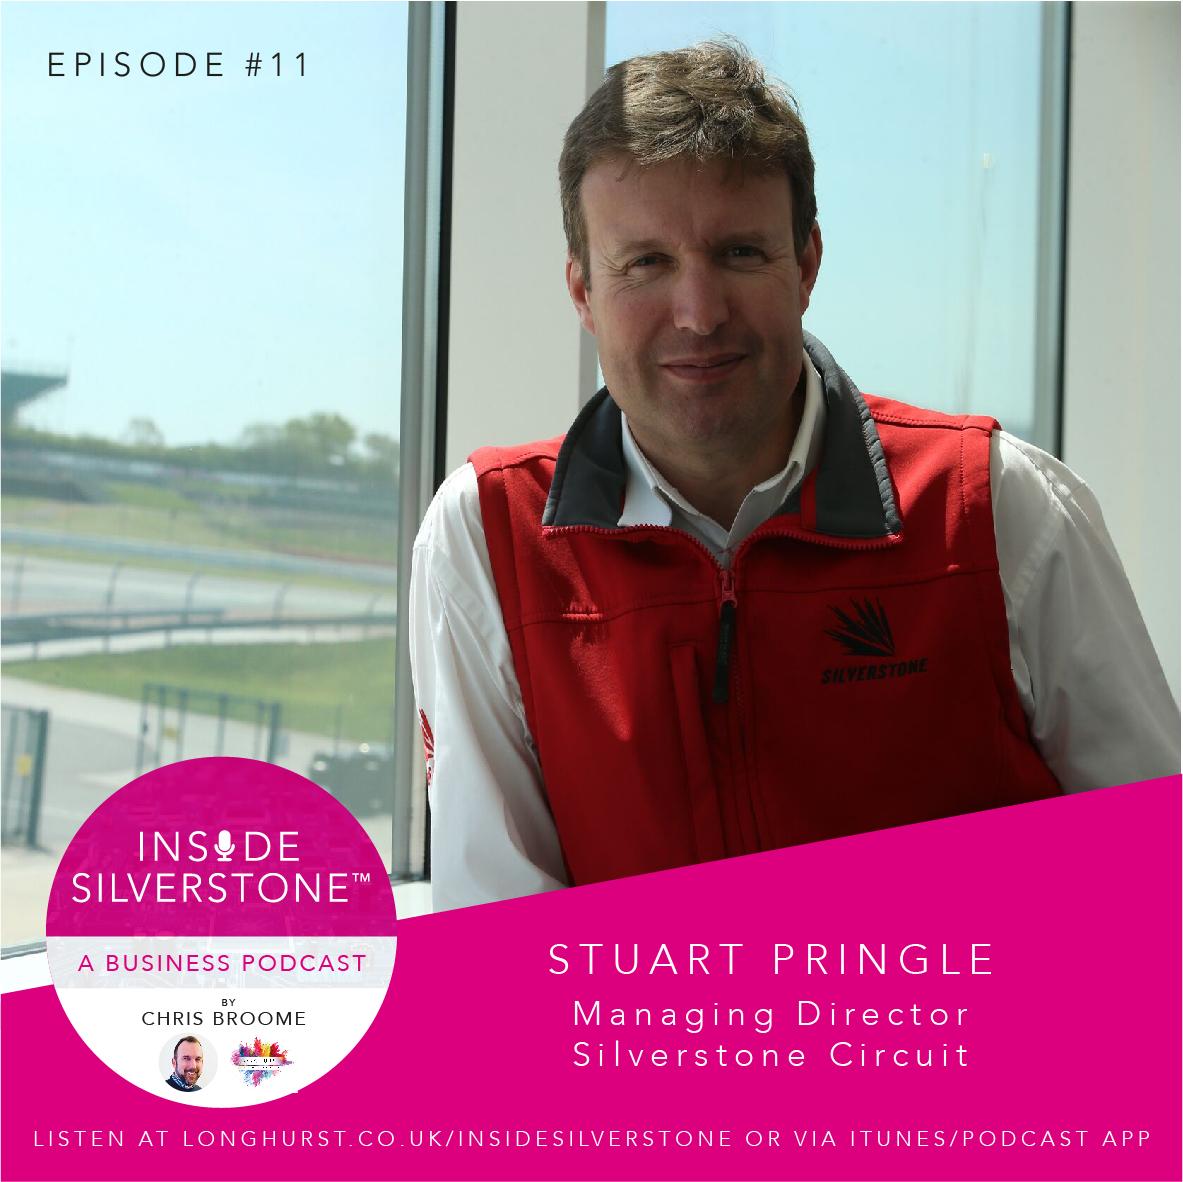 Stuart Pringle, Managing Director, Silverstone Circuit